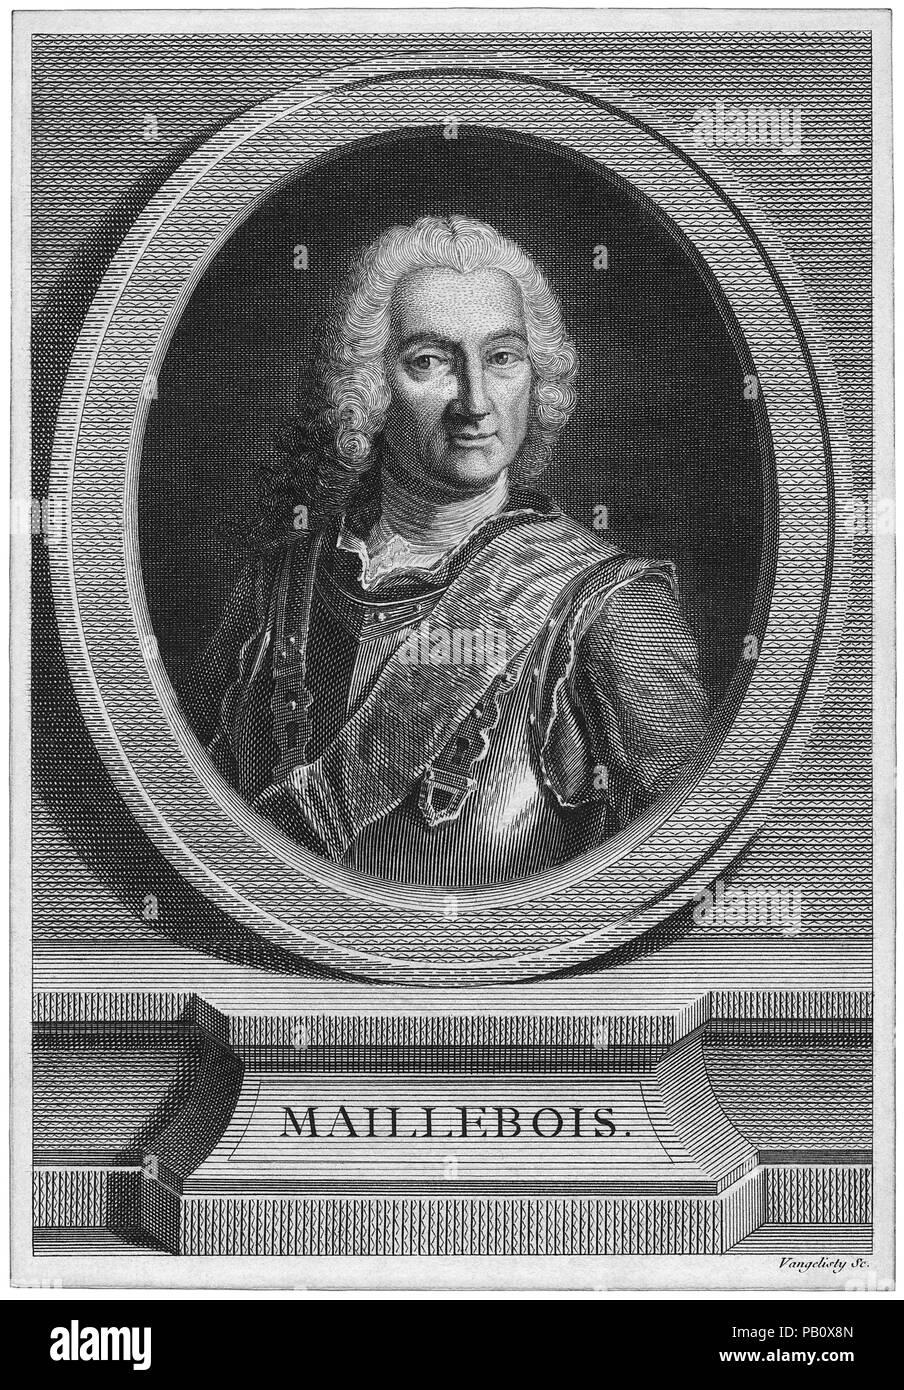 Jean-Baptiste Francois des Marets, marquis de Maillebois (1682-1762), French Marshal, Portrait, Engraving - Stock Image